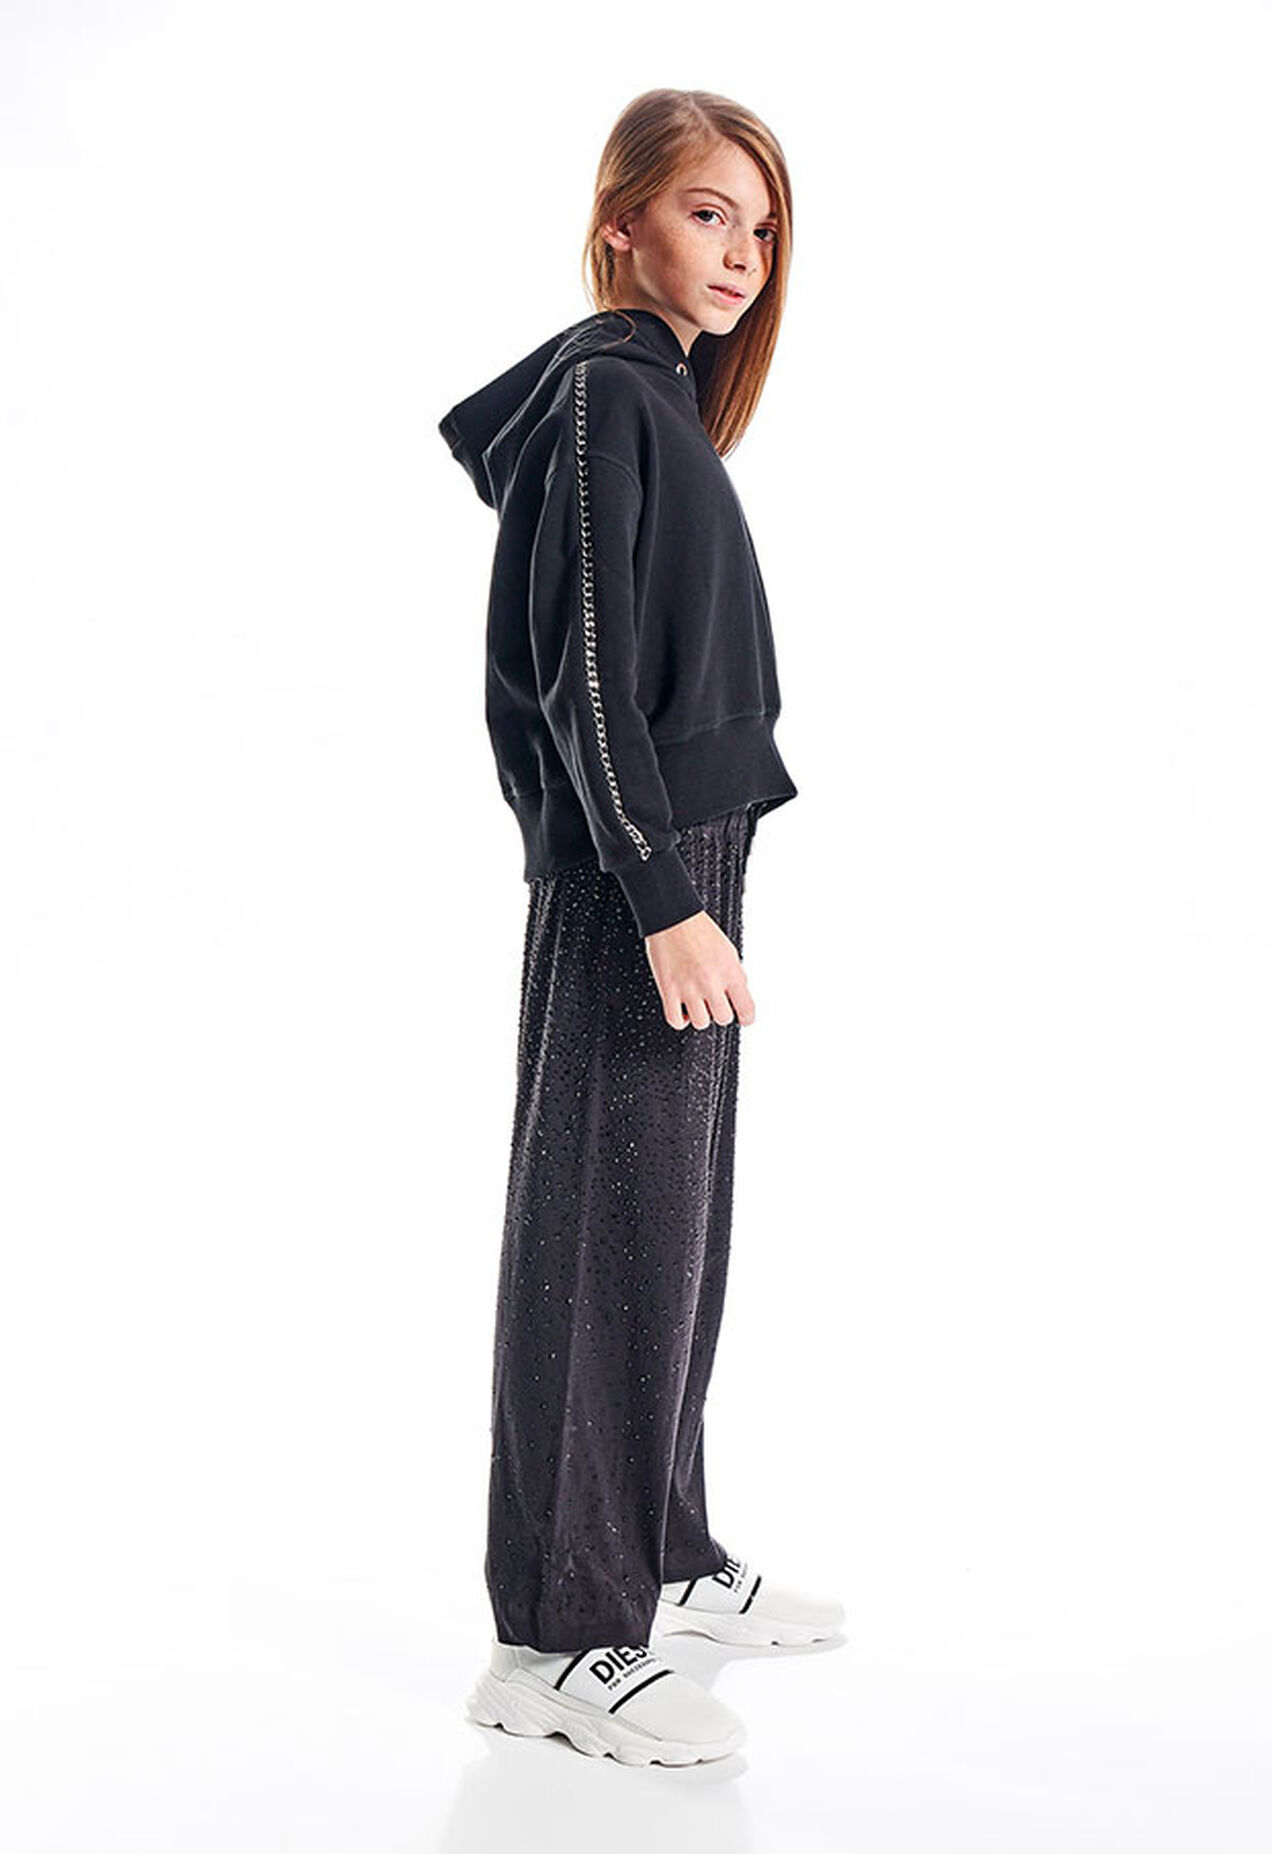 PSTRASSC, Negro - Pantalones